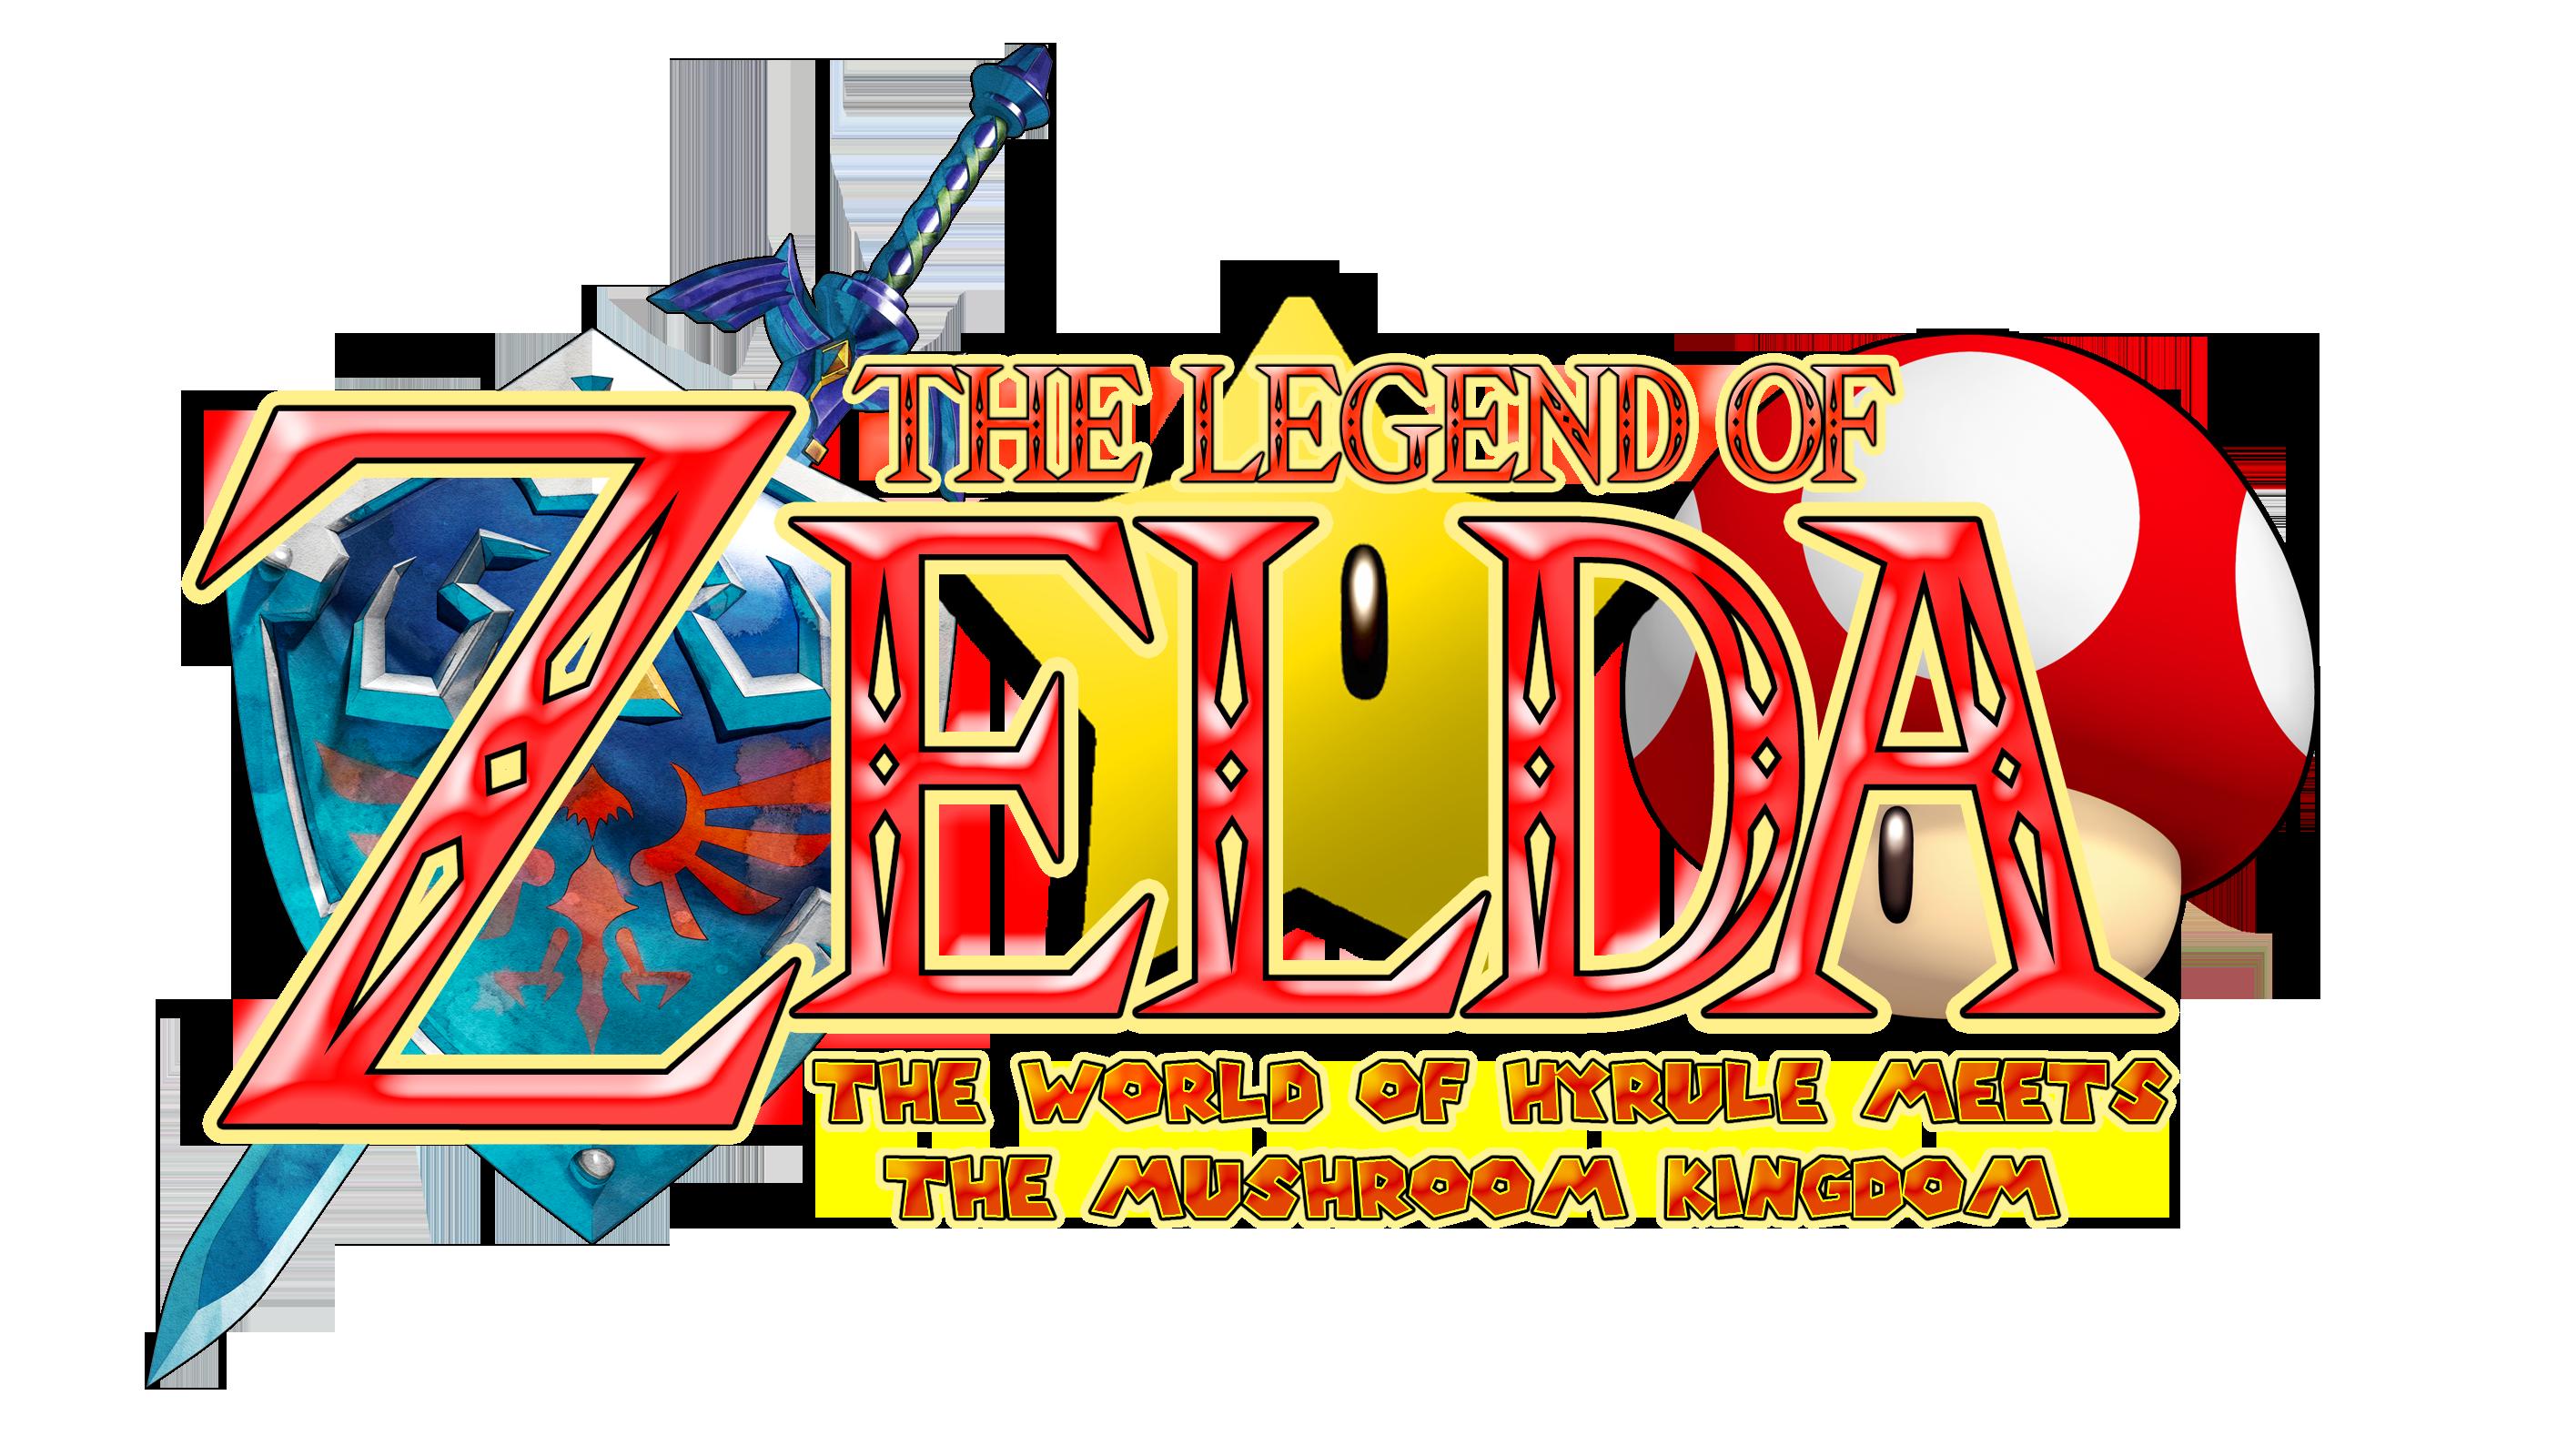 the legend of zelda twohmtmk logo png